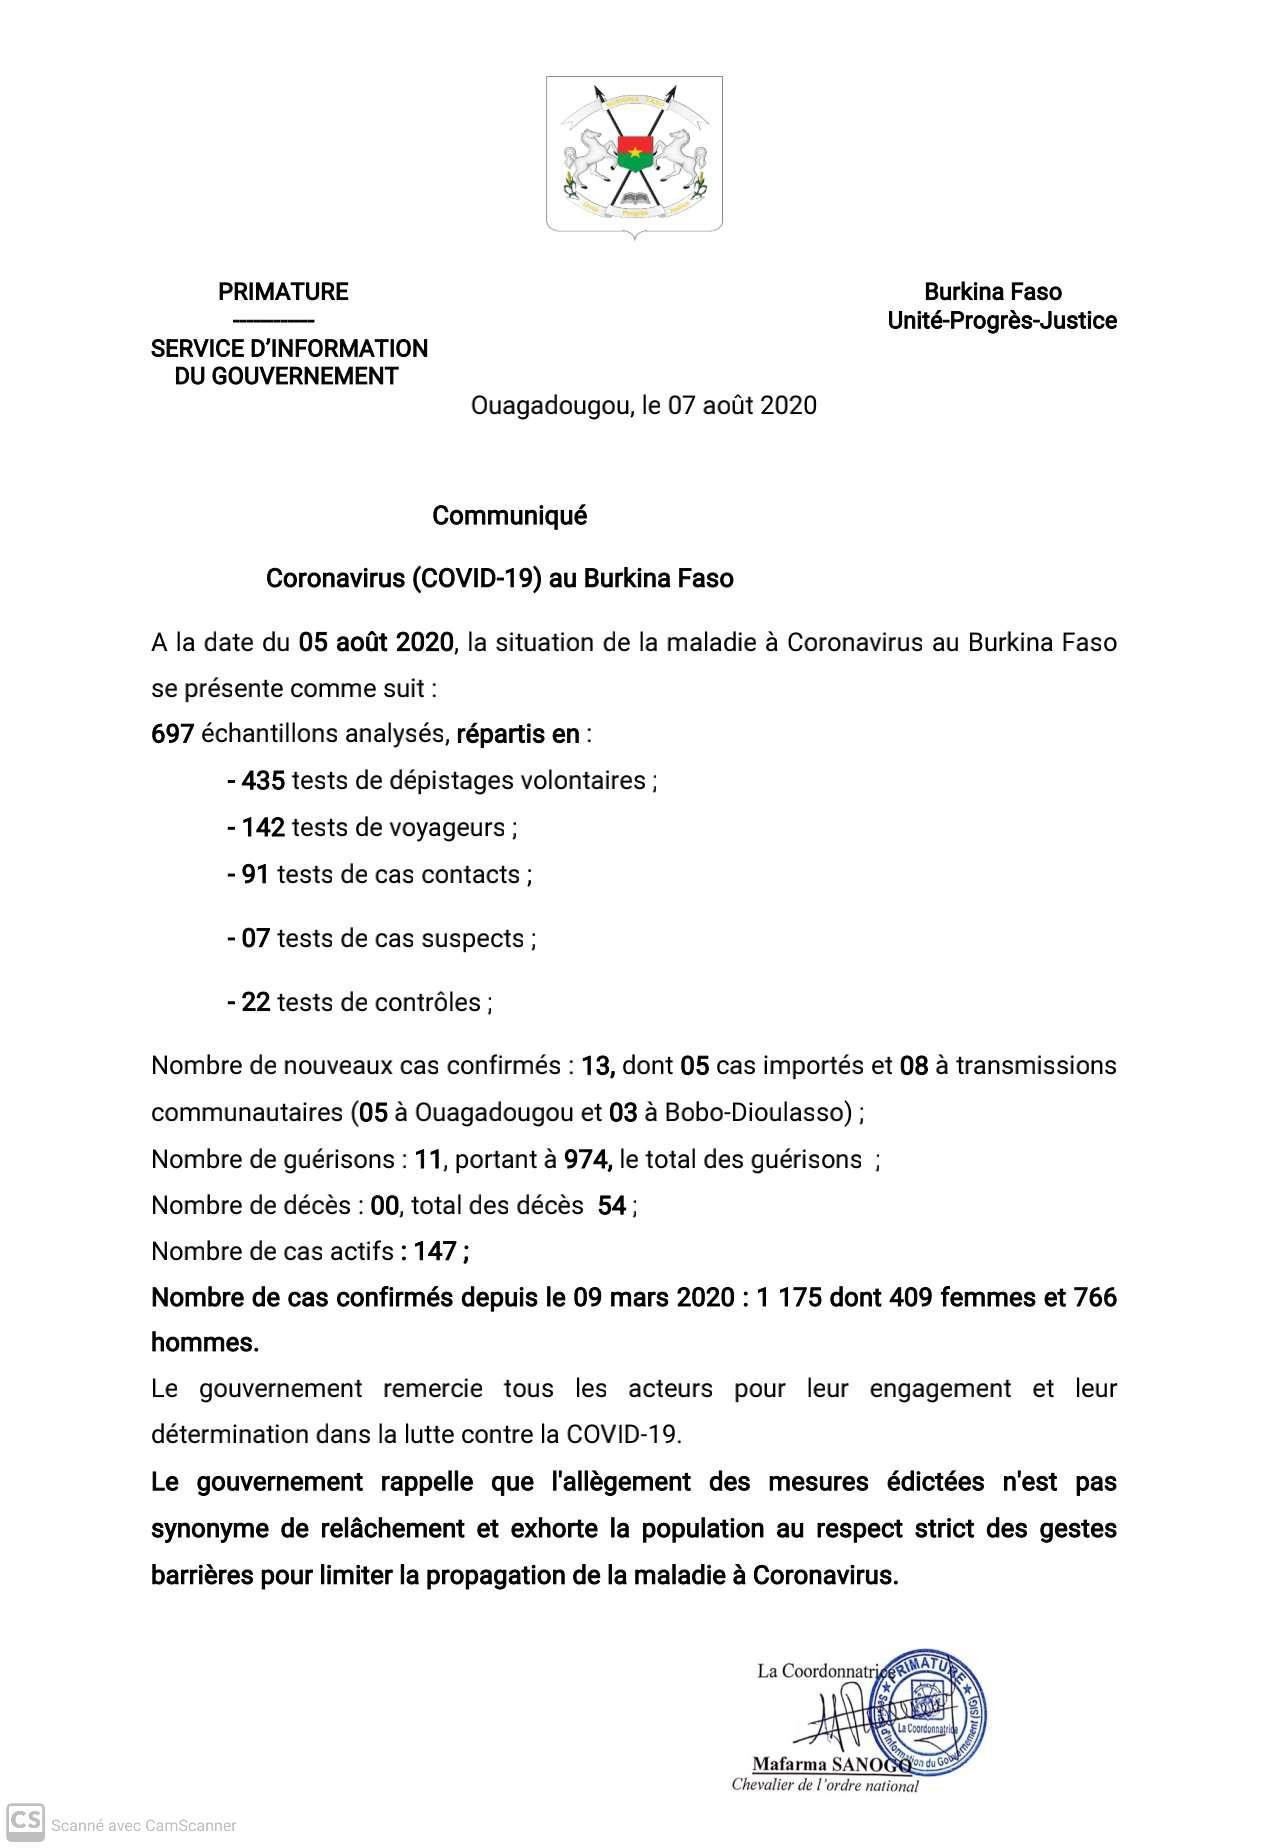 https://www.sig.gov.bf/fileadmin/user_upload/Communique___point__Covid-19_Burkina_Faso_05_aout_2020.jpg